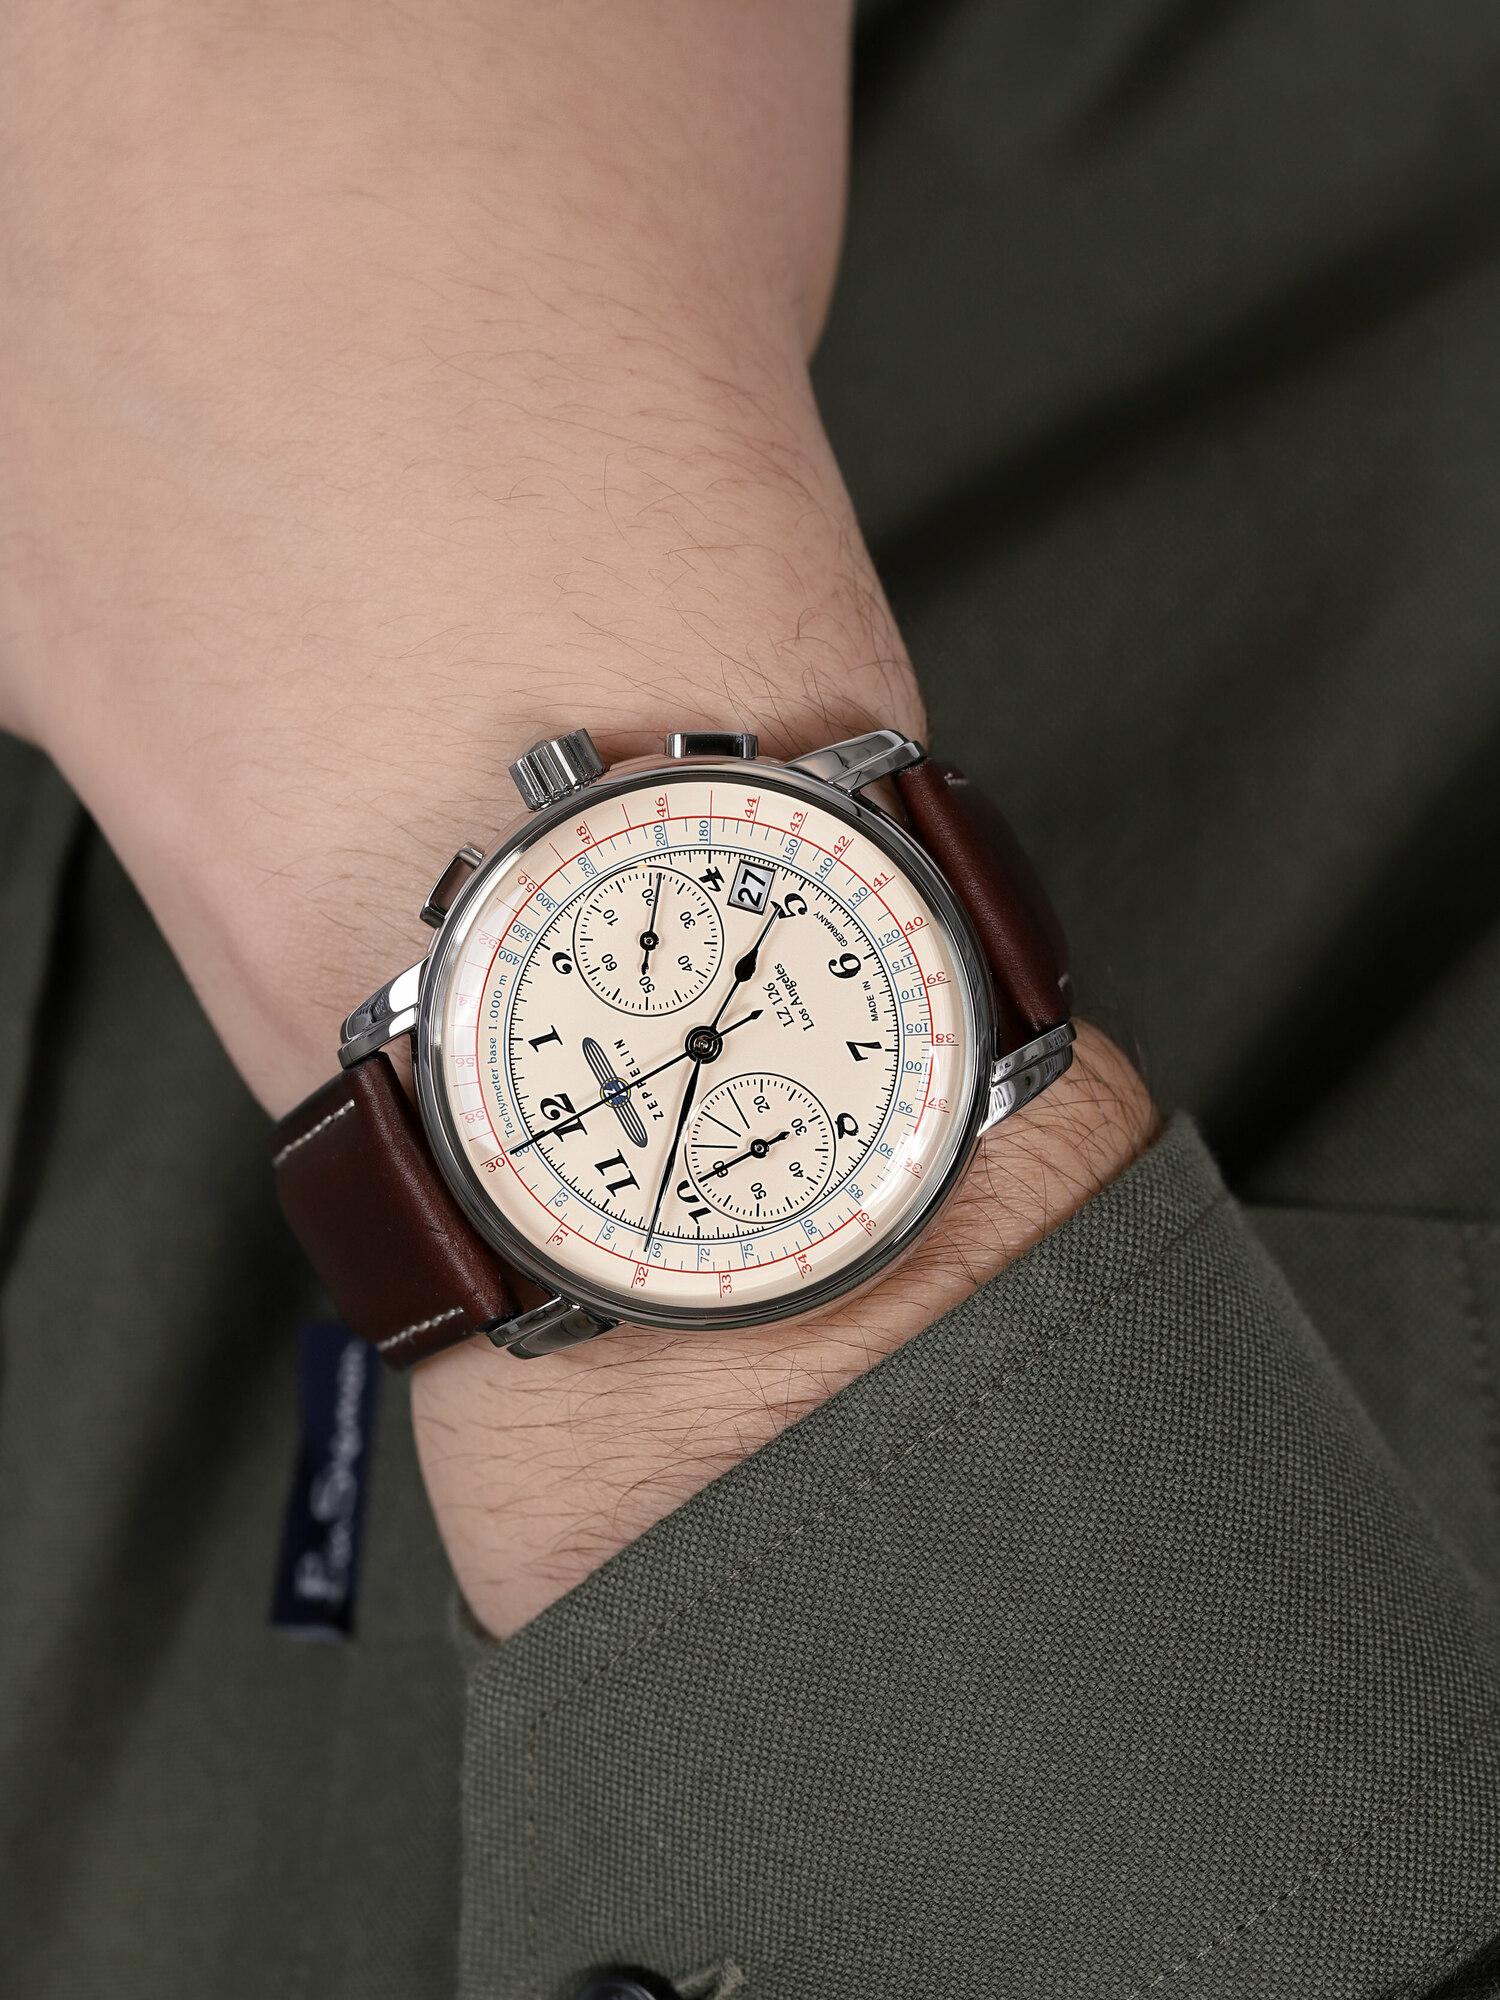 zegarek Zeppelin 7614-5 kwarcowy męski Los Angeles Los Angeles